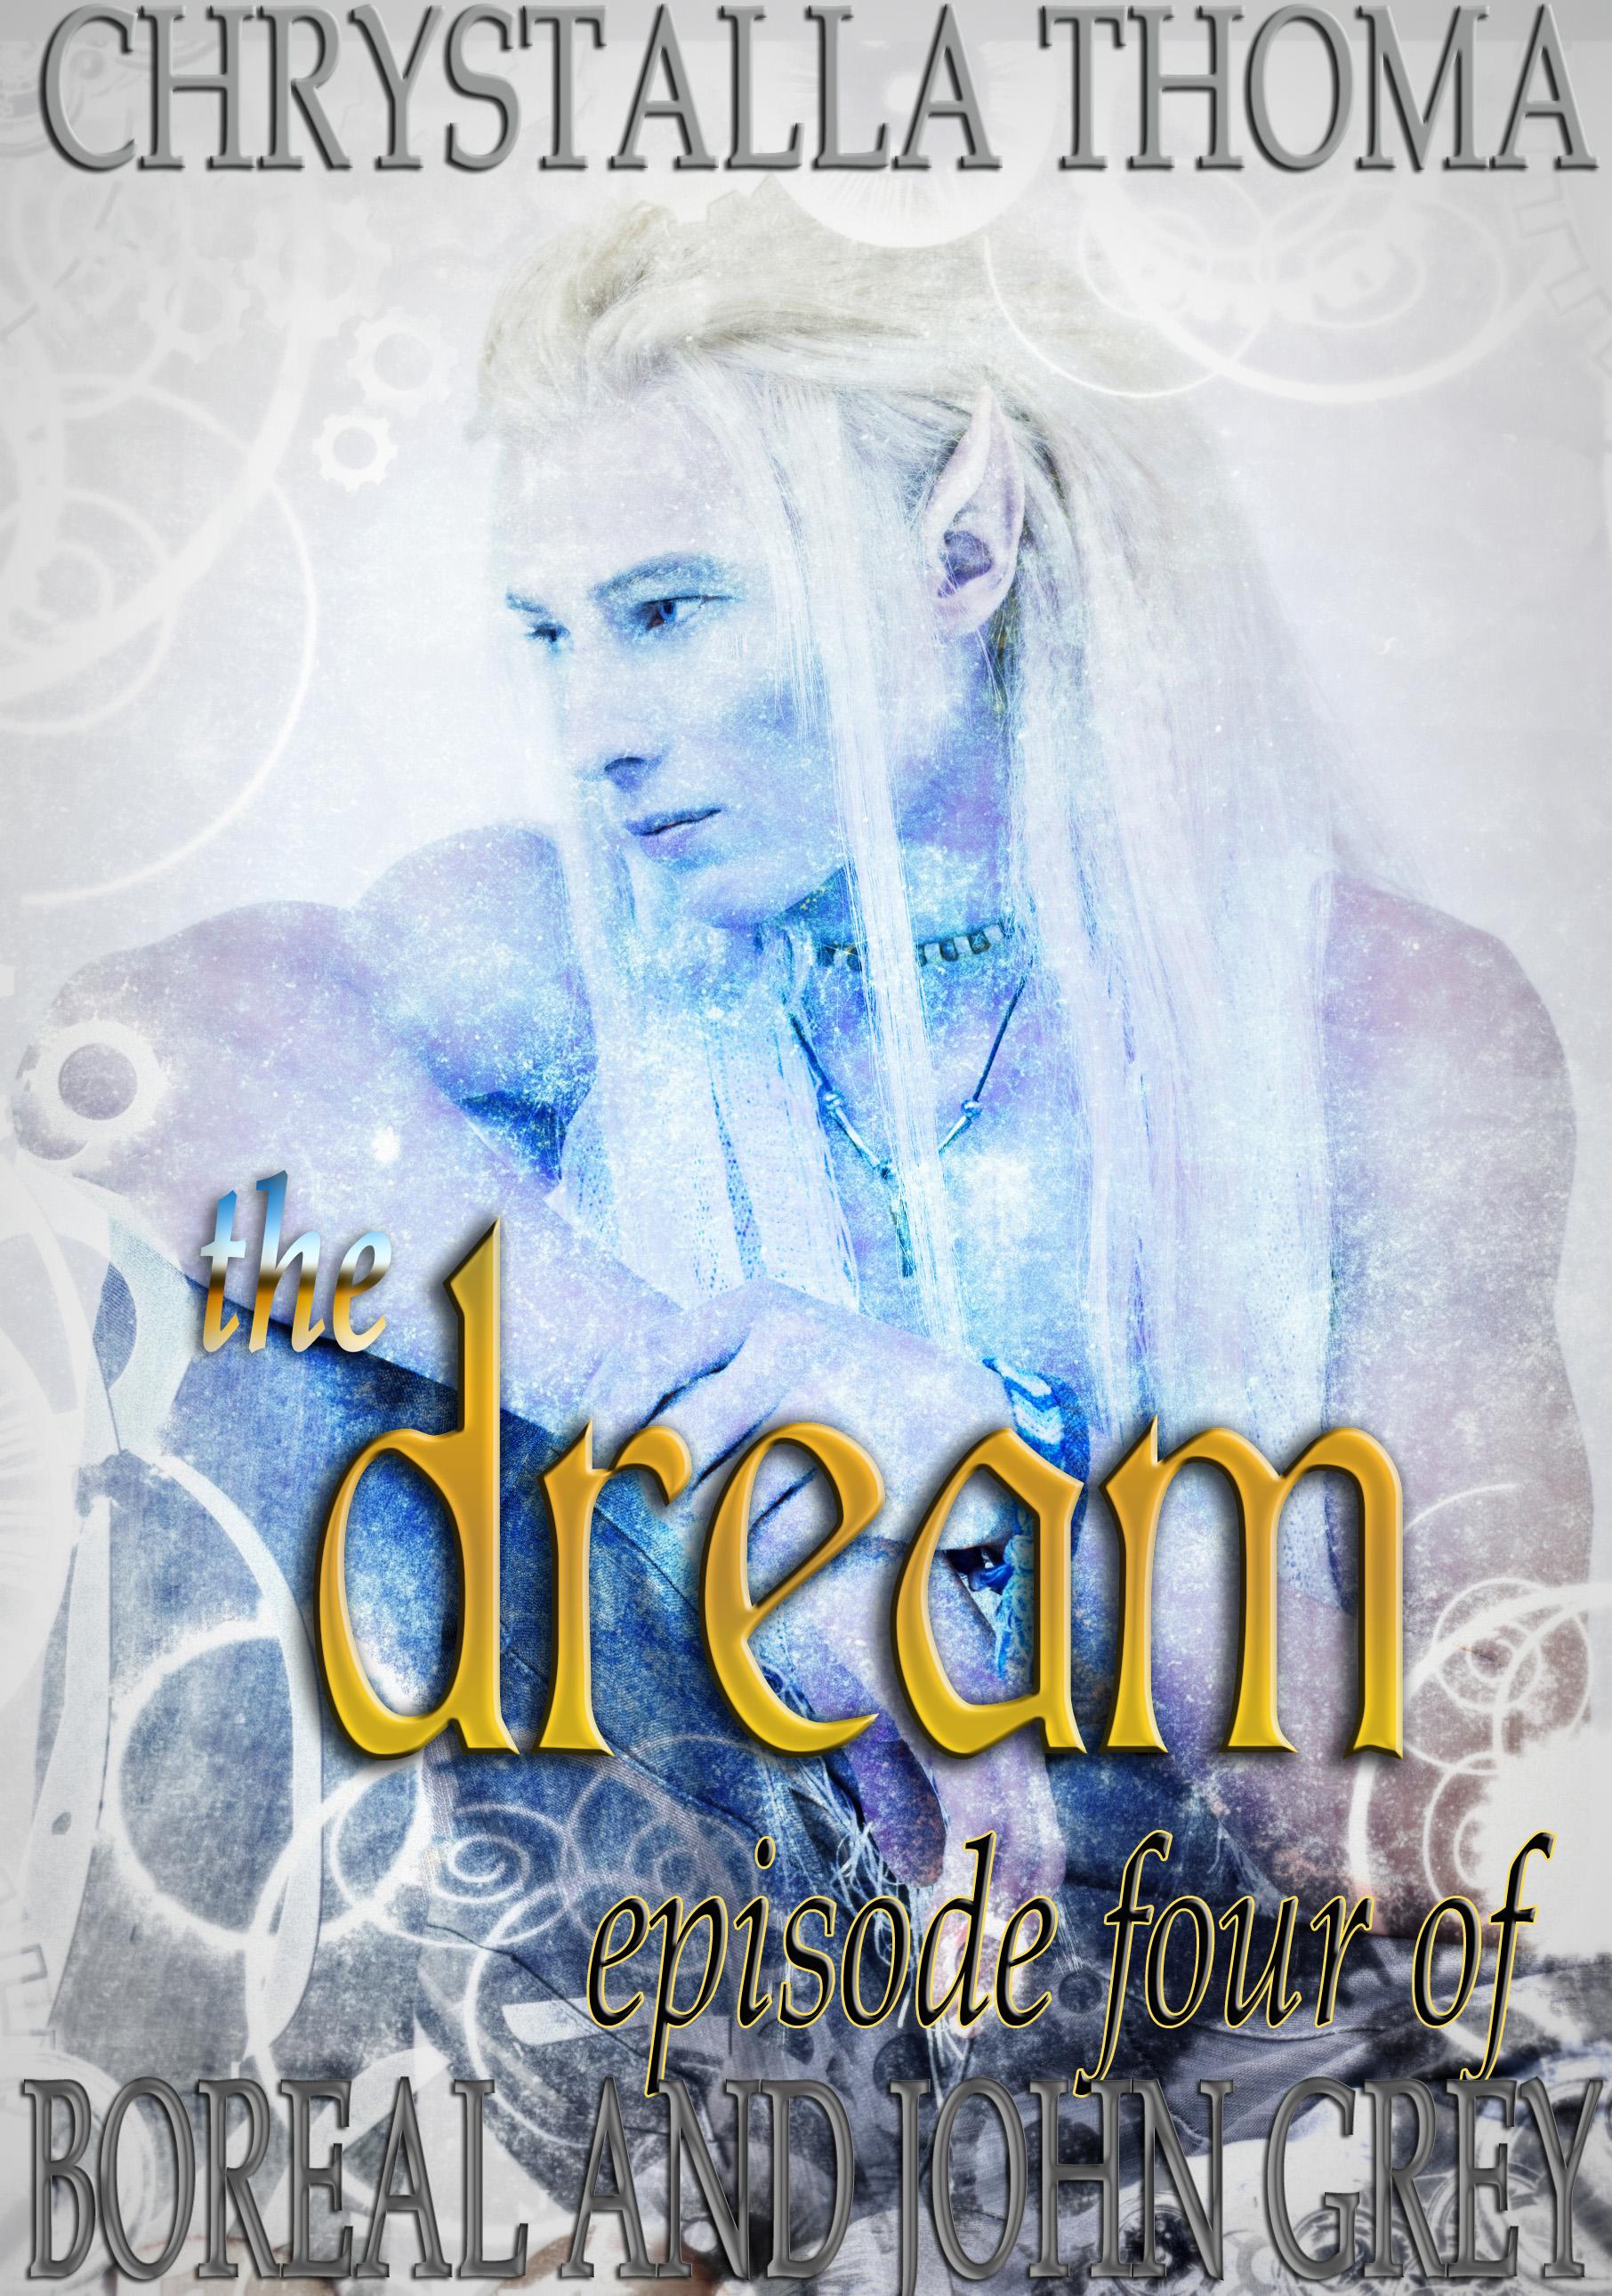 http://www.dreamstime.com/-image22227785